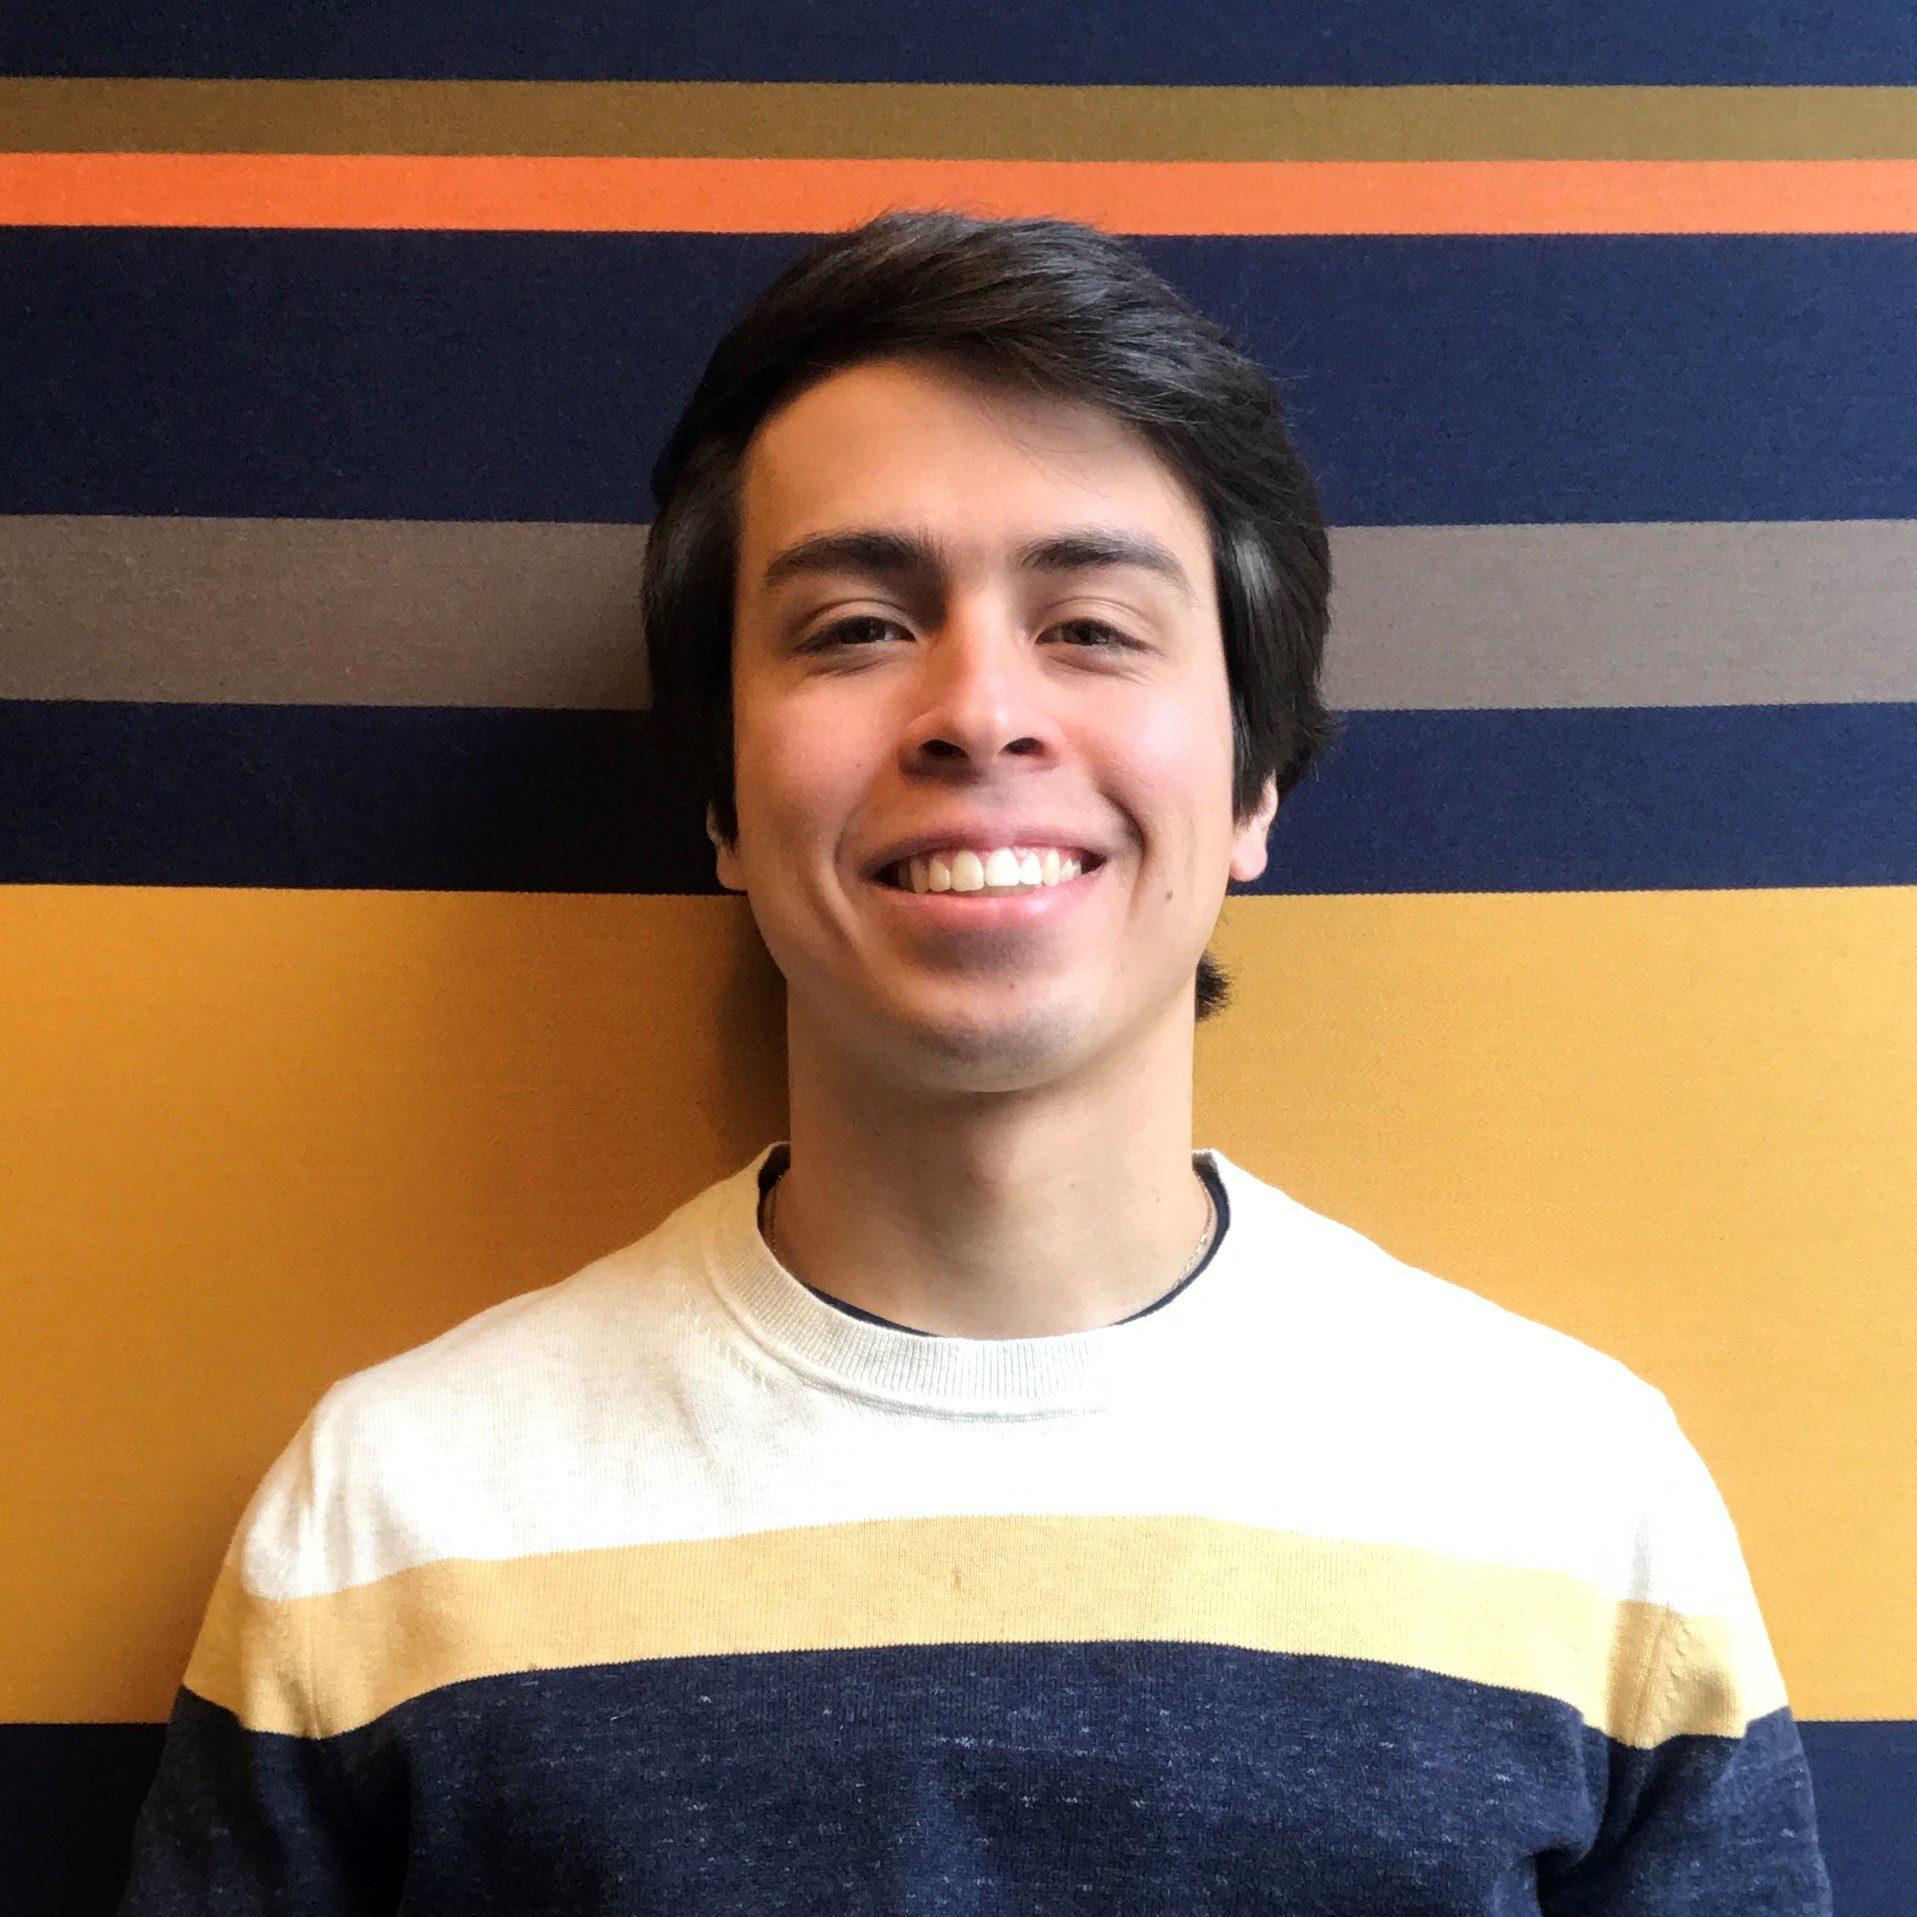 Rodrigo Samayoa